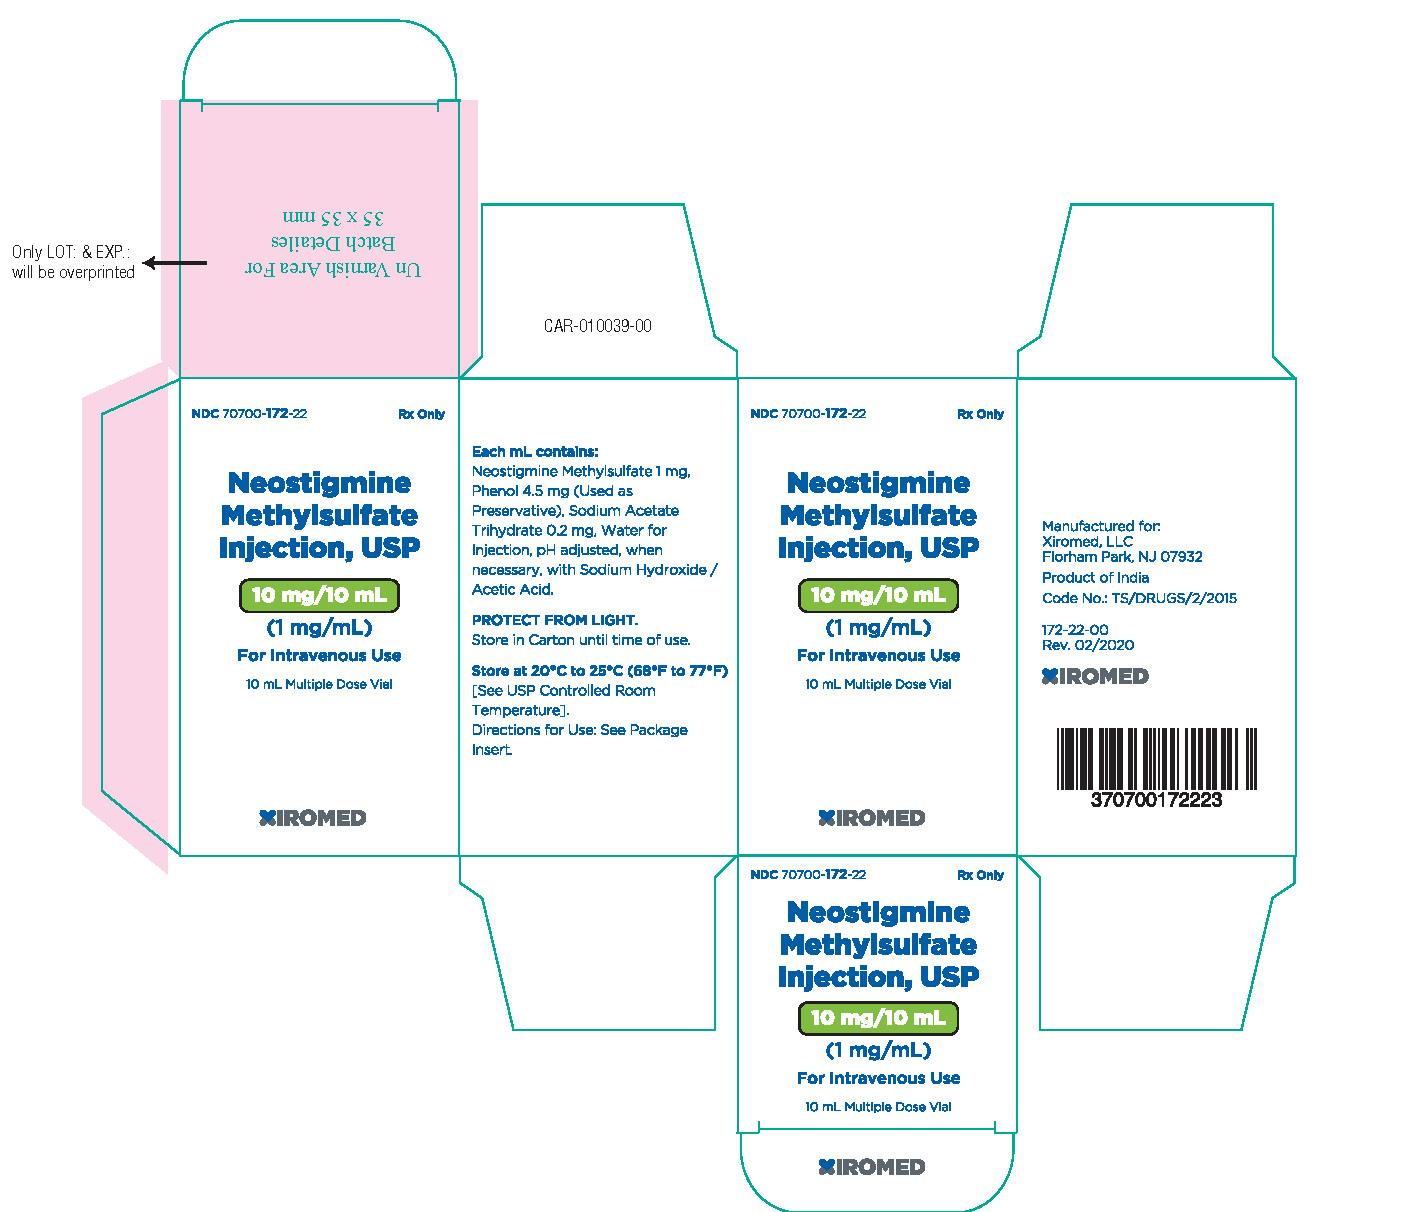 Neostigmine-SPL-Carton-1-10